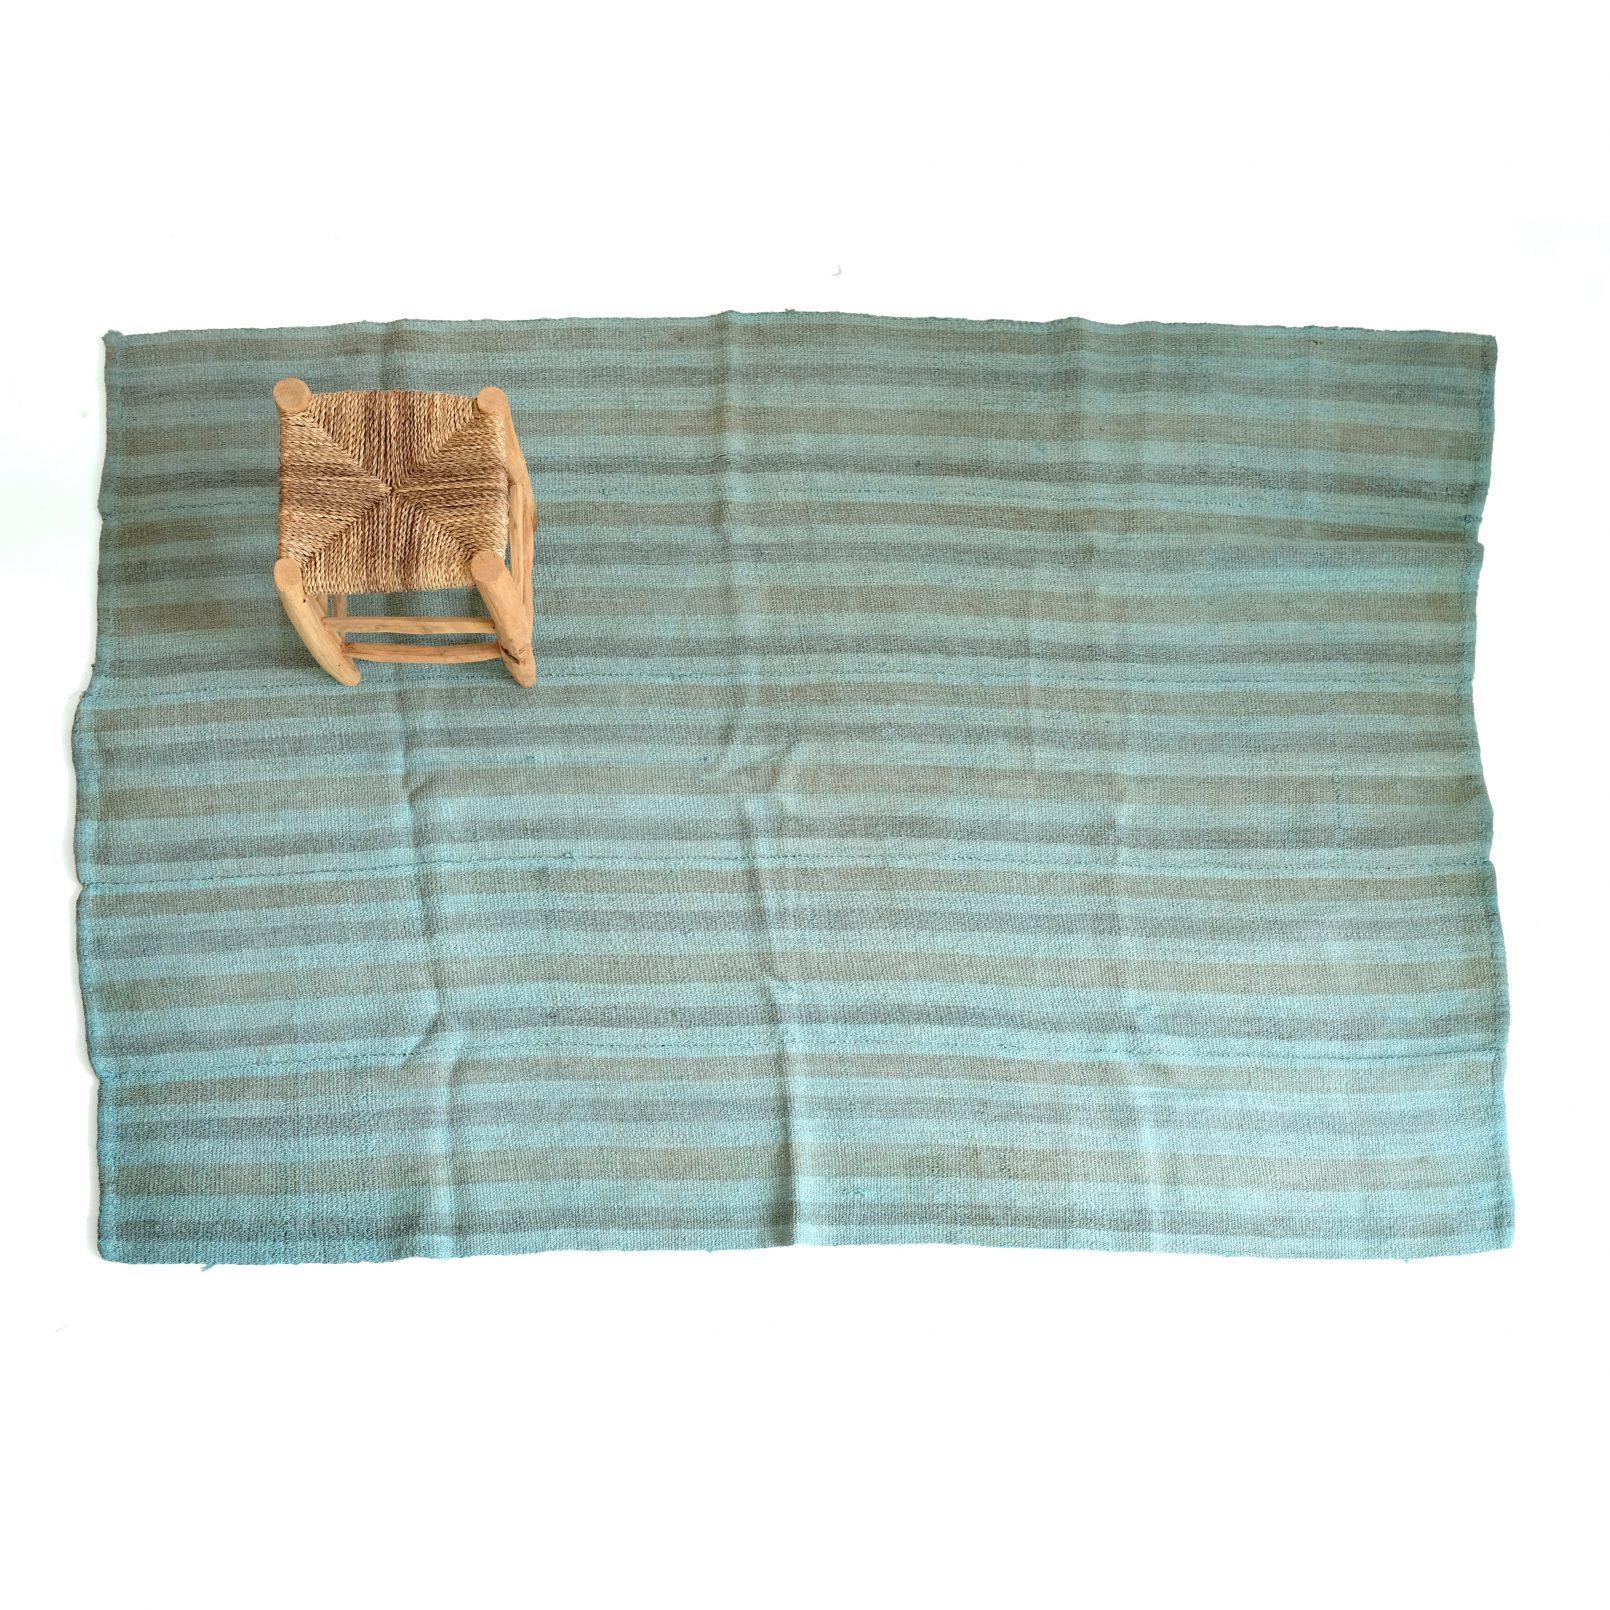 Turkish blue rug, 150 x 195 cm.